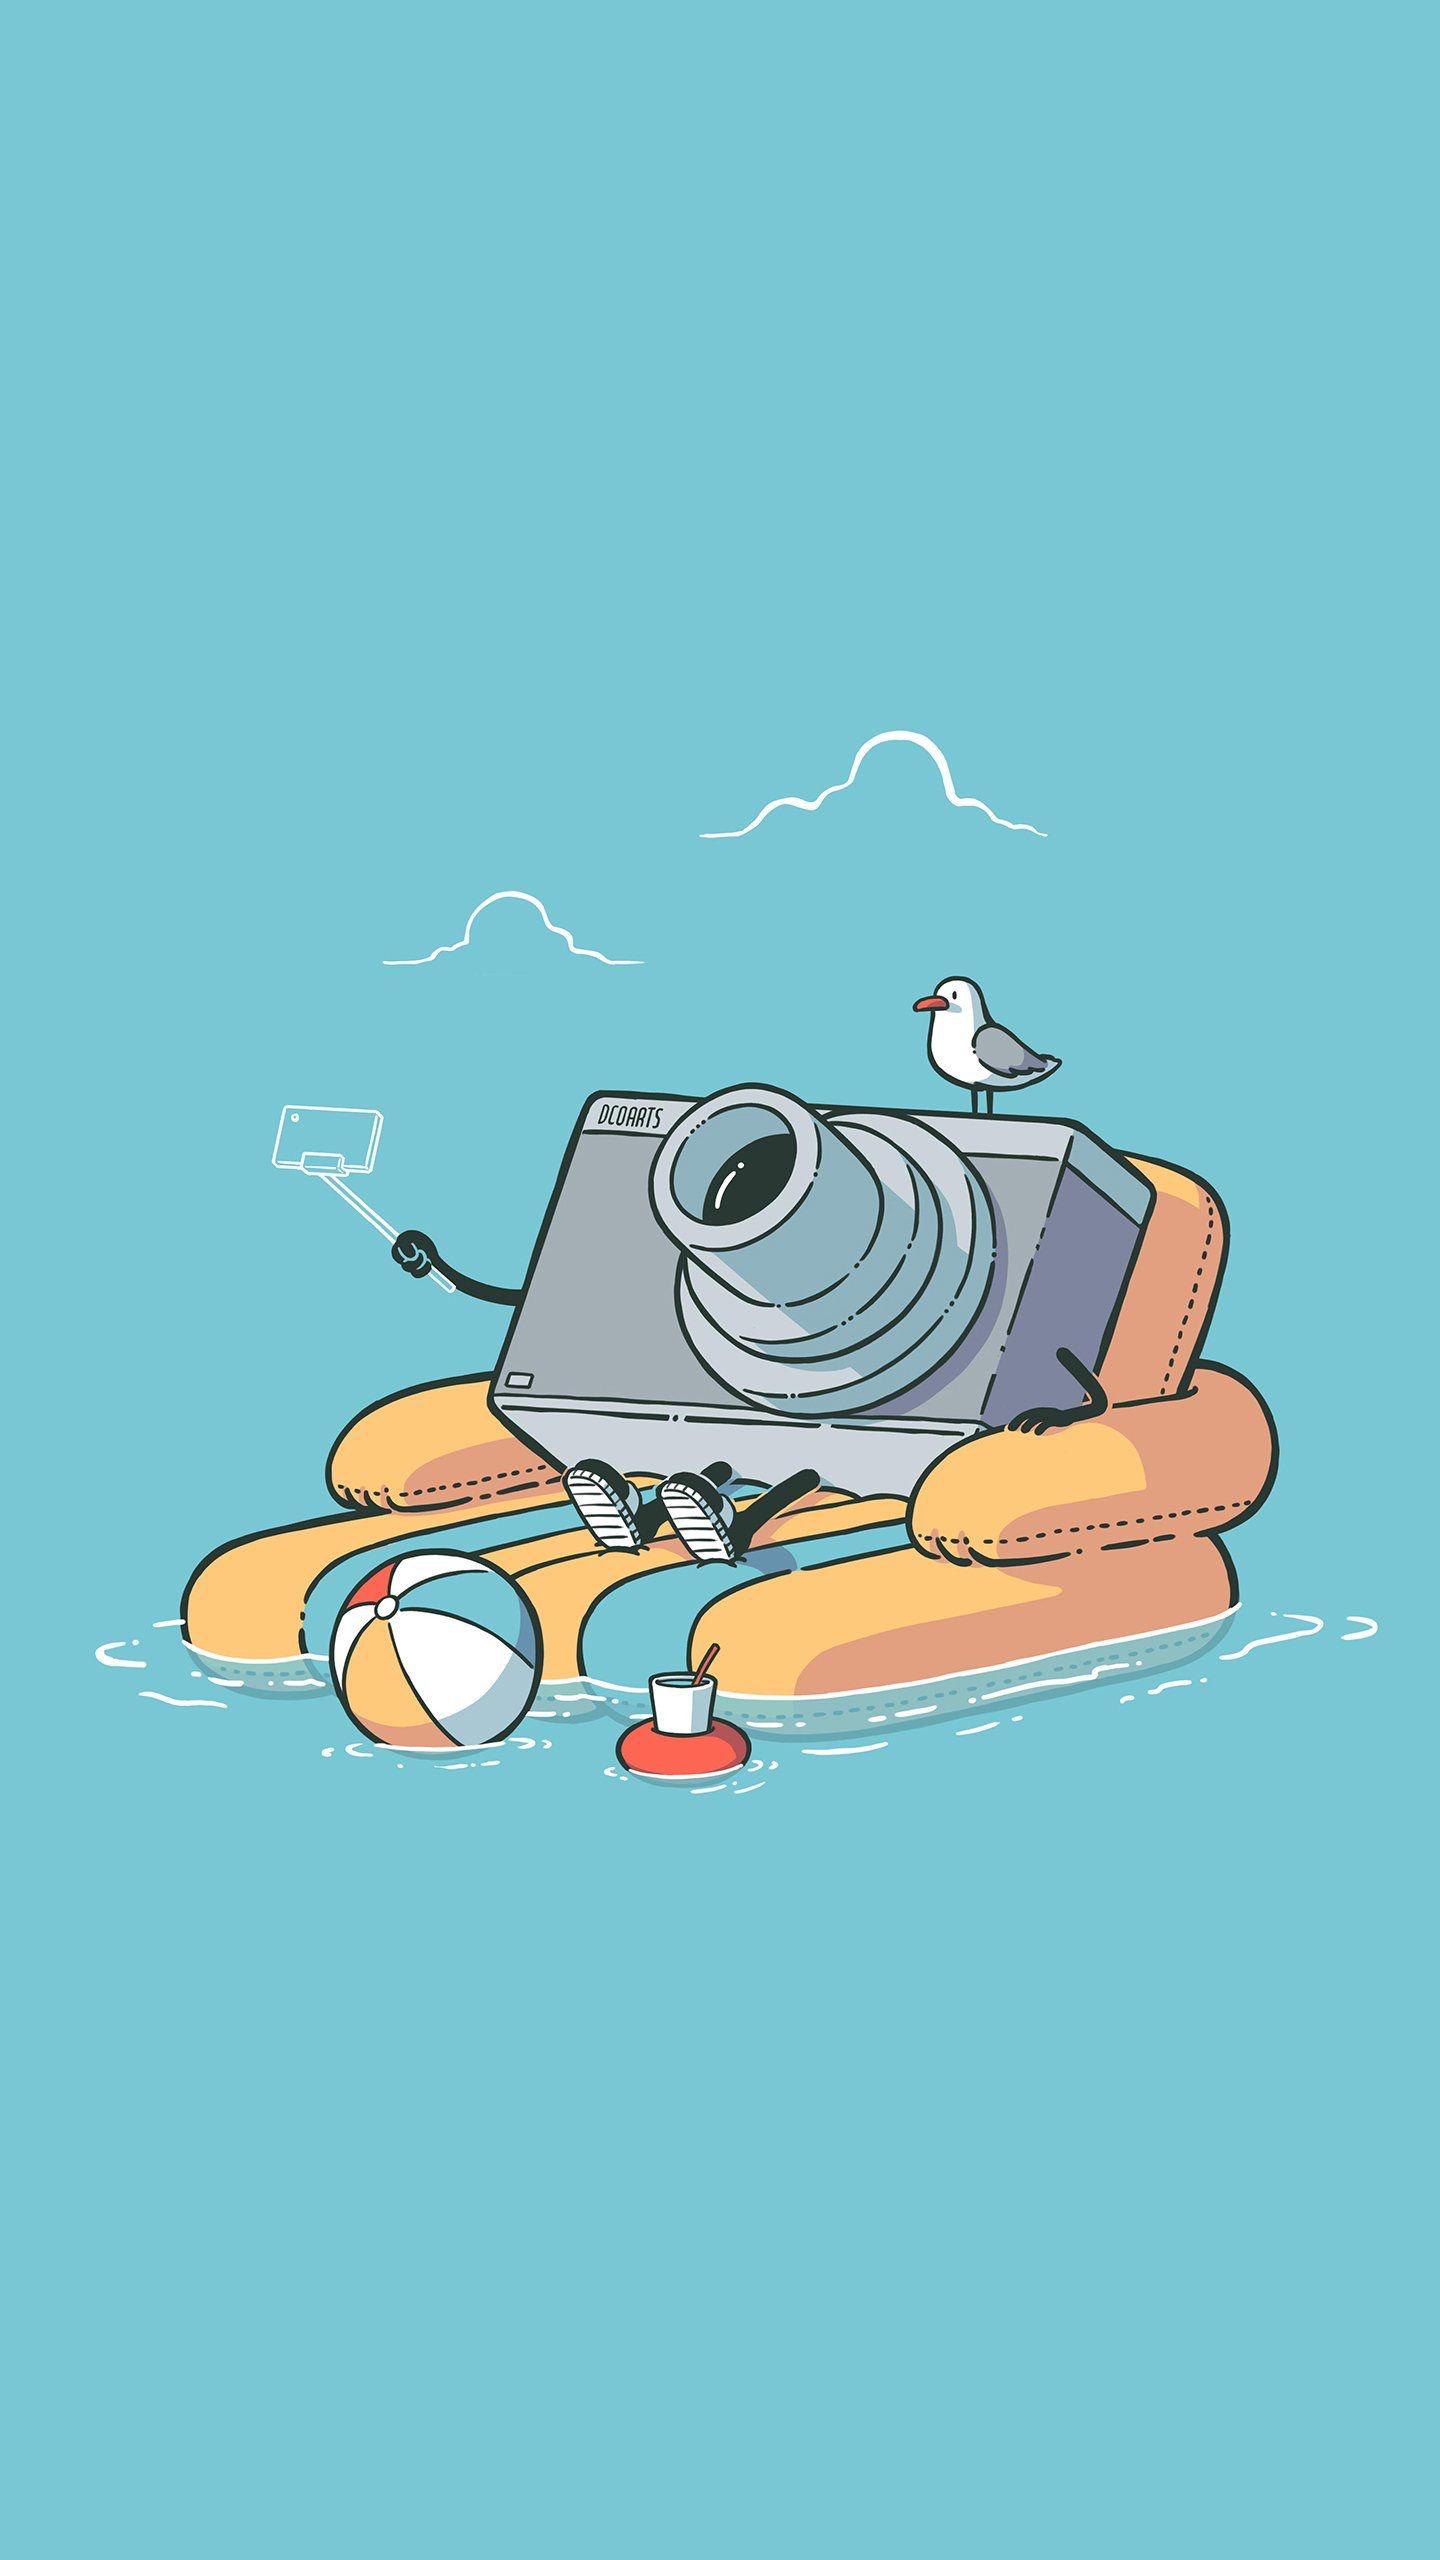 Vertical Digital Art Simple Background Camera Seagulls Water 1440x2560 Wallpaper Wallhaven Cc Cartoon Wallpaper Spongebob Wallpaper Space Artwork